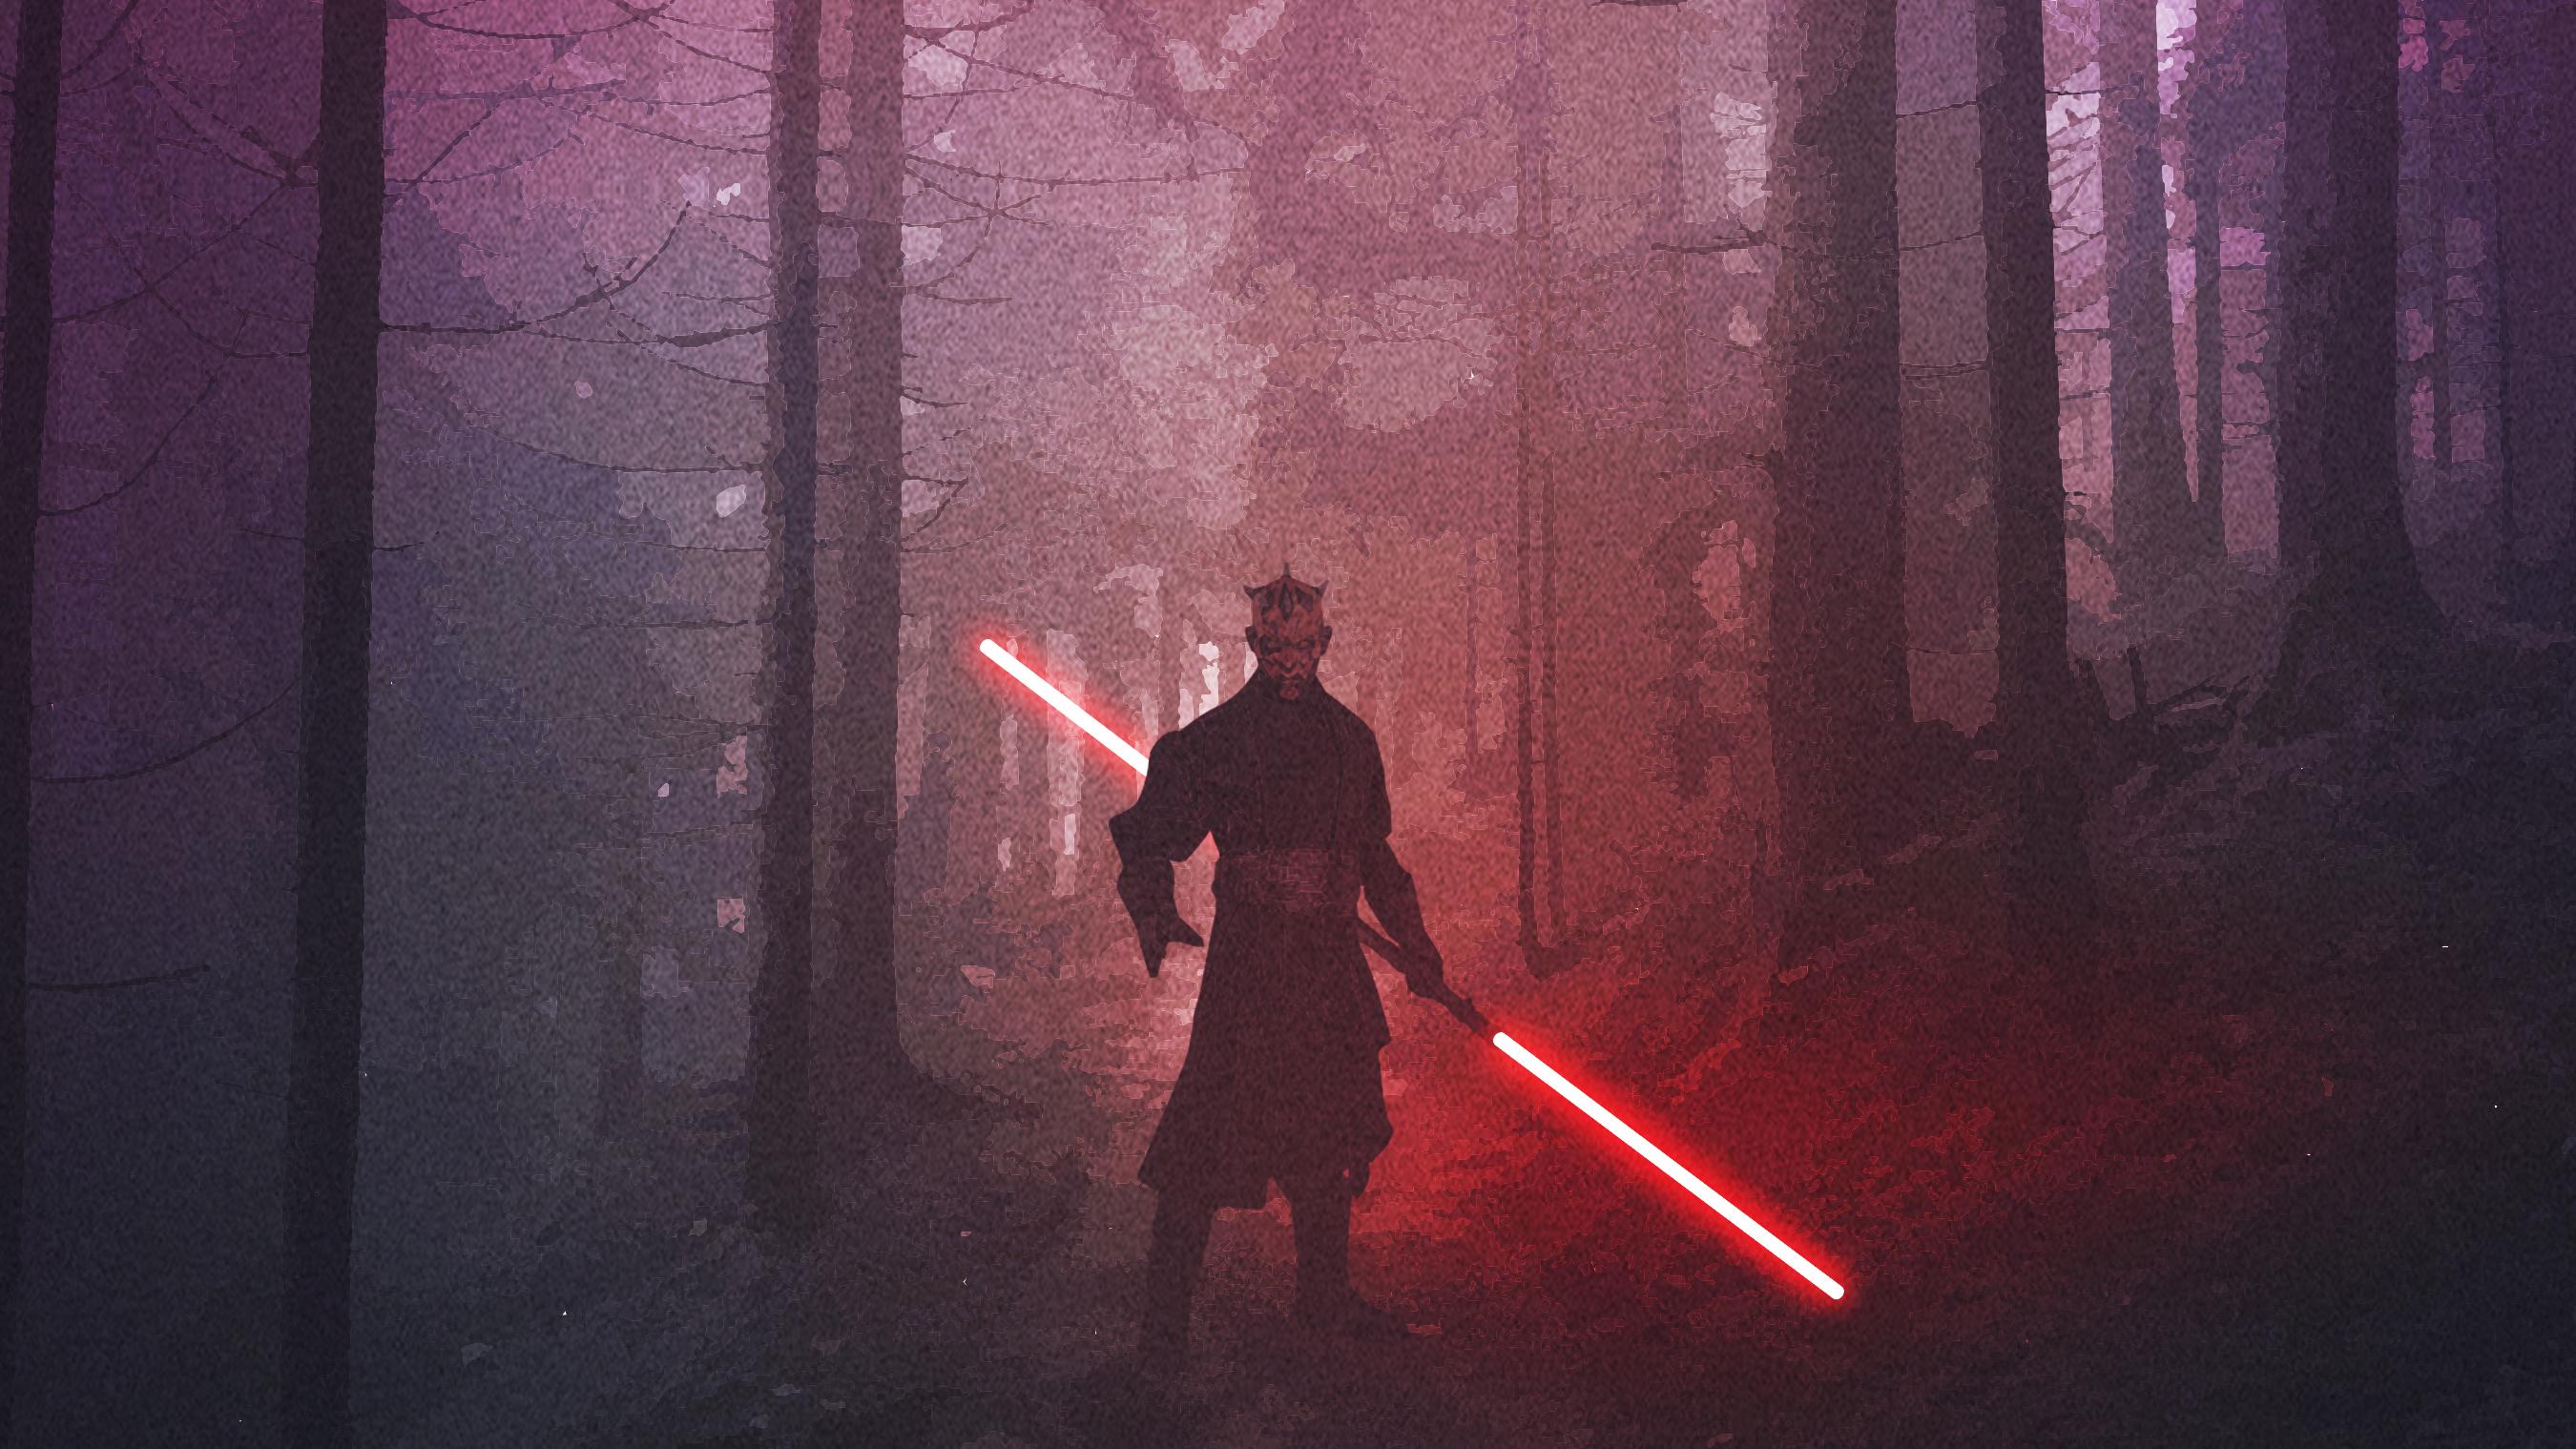 Darth Maul Star Wars Fanart, HD Superheroes, 4k Wallpapers ...